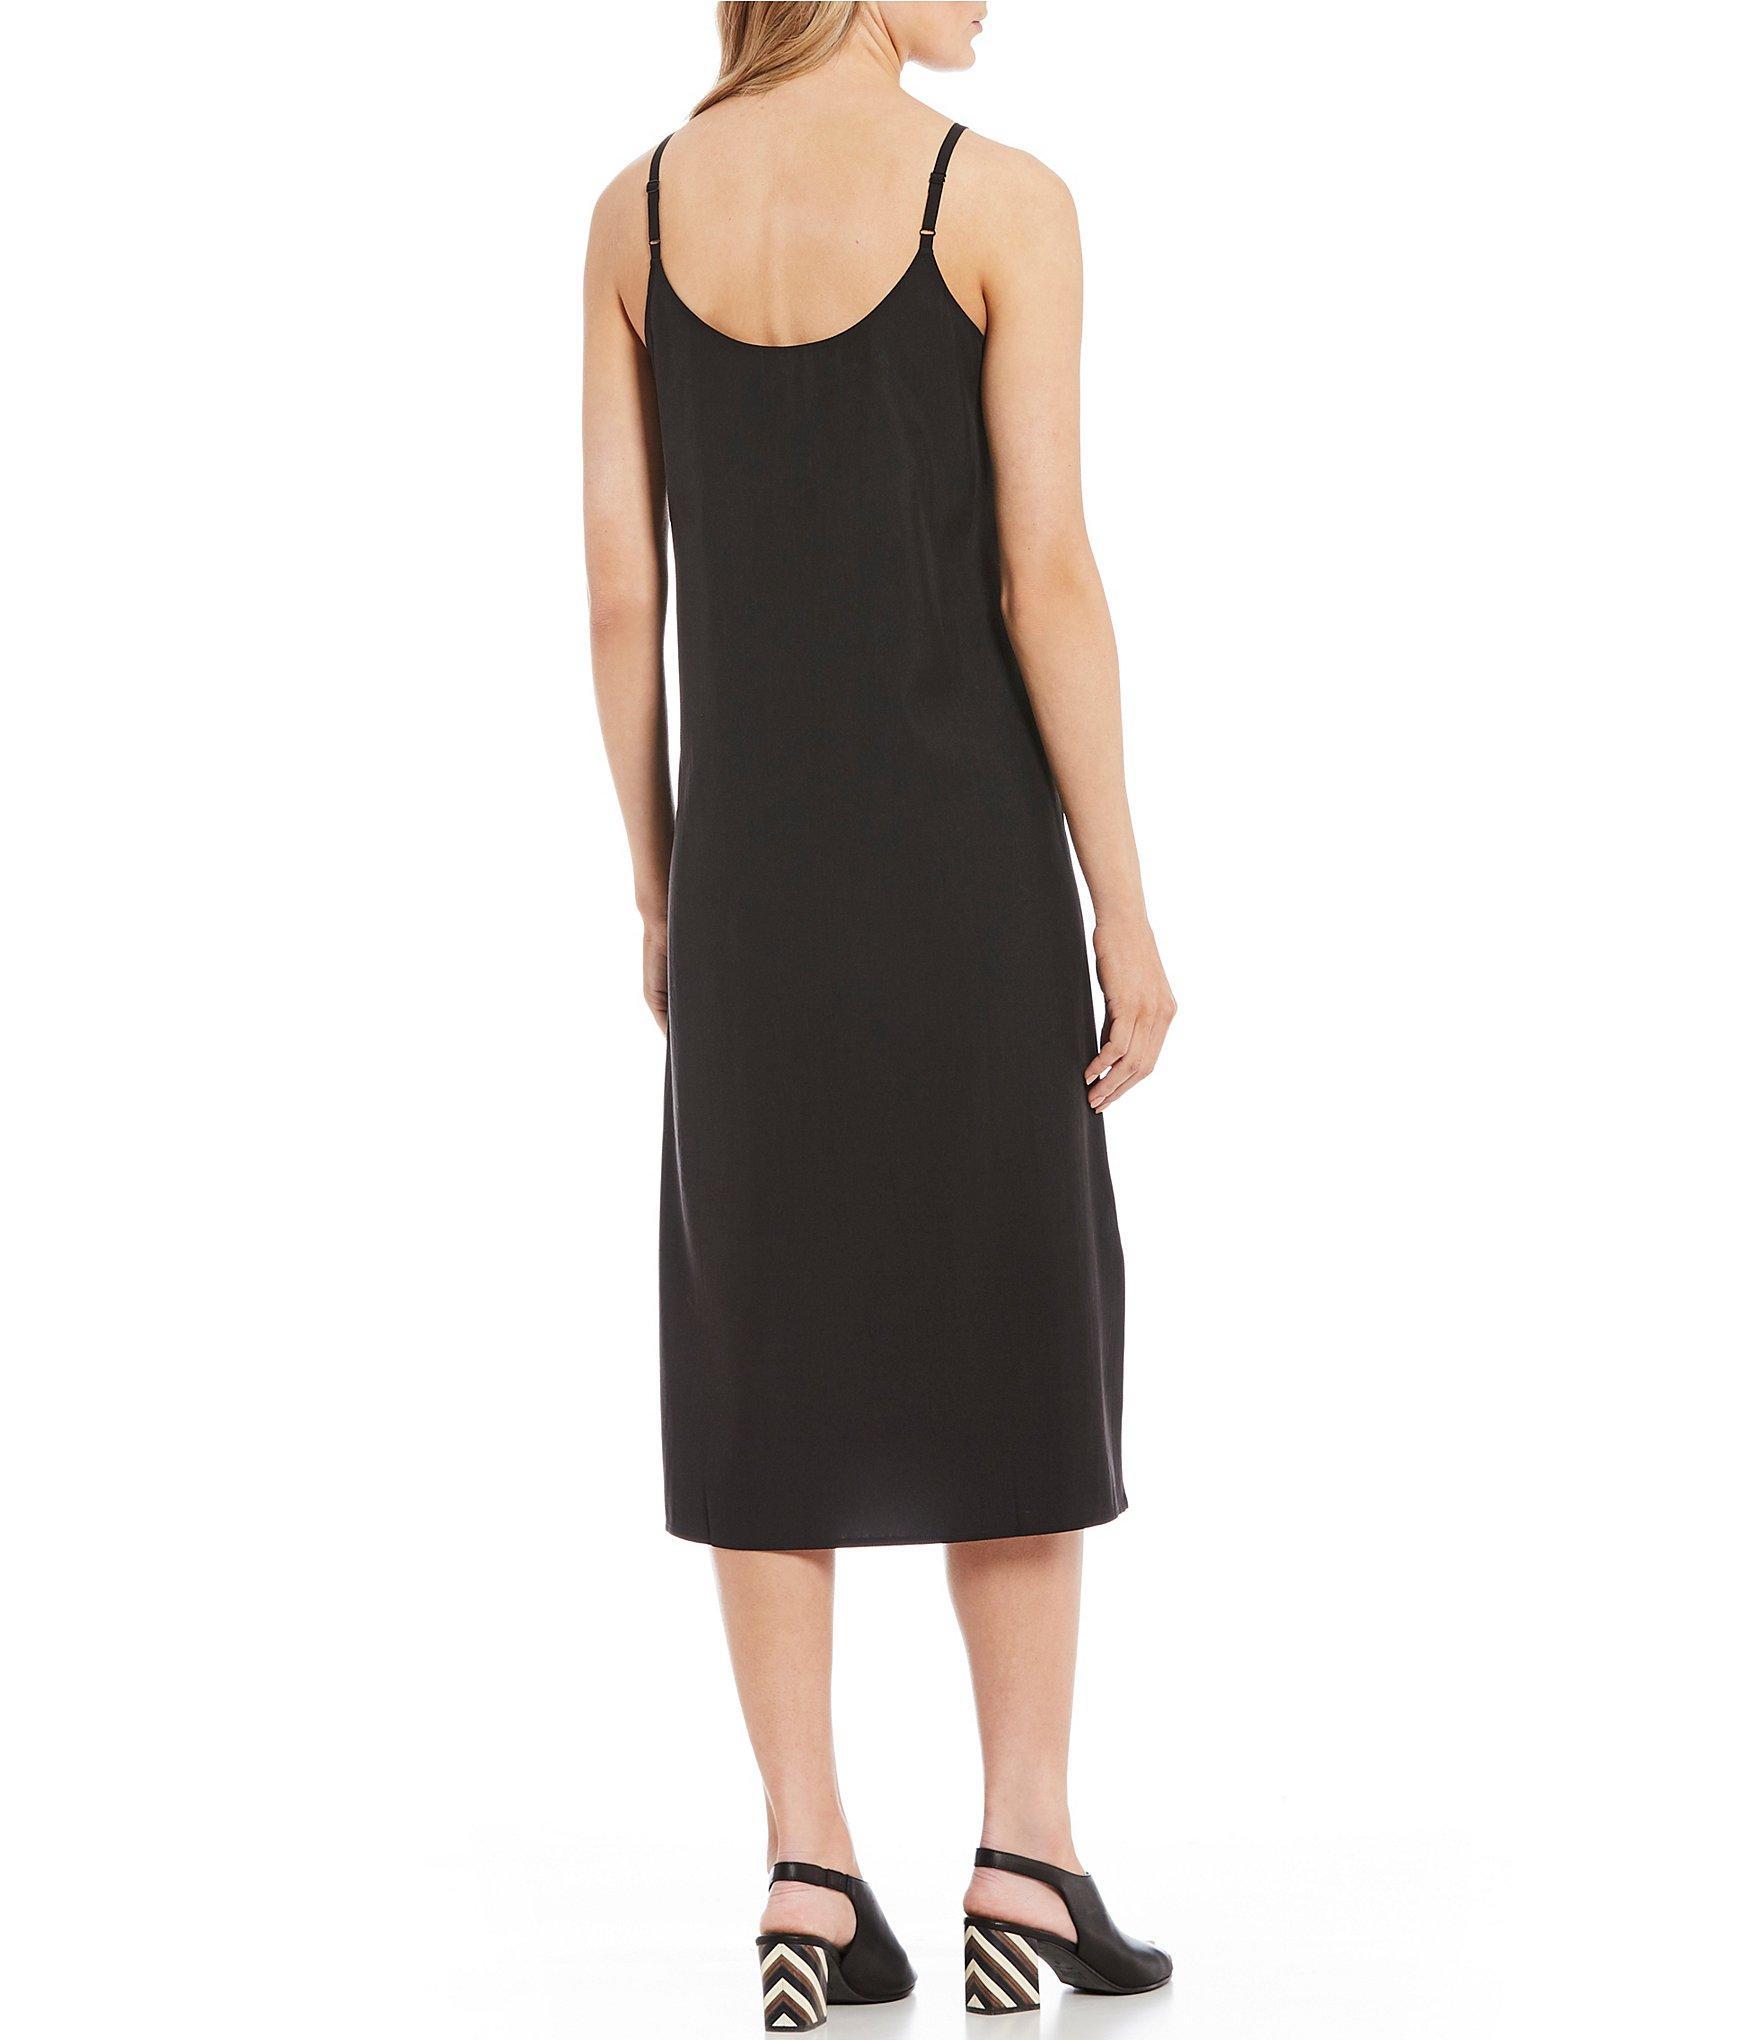 72af6cd54a9dbc Eileen Fisher - Black Cami Sleeveless Slit Midi Dress - Lyst. View  fullscreen